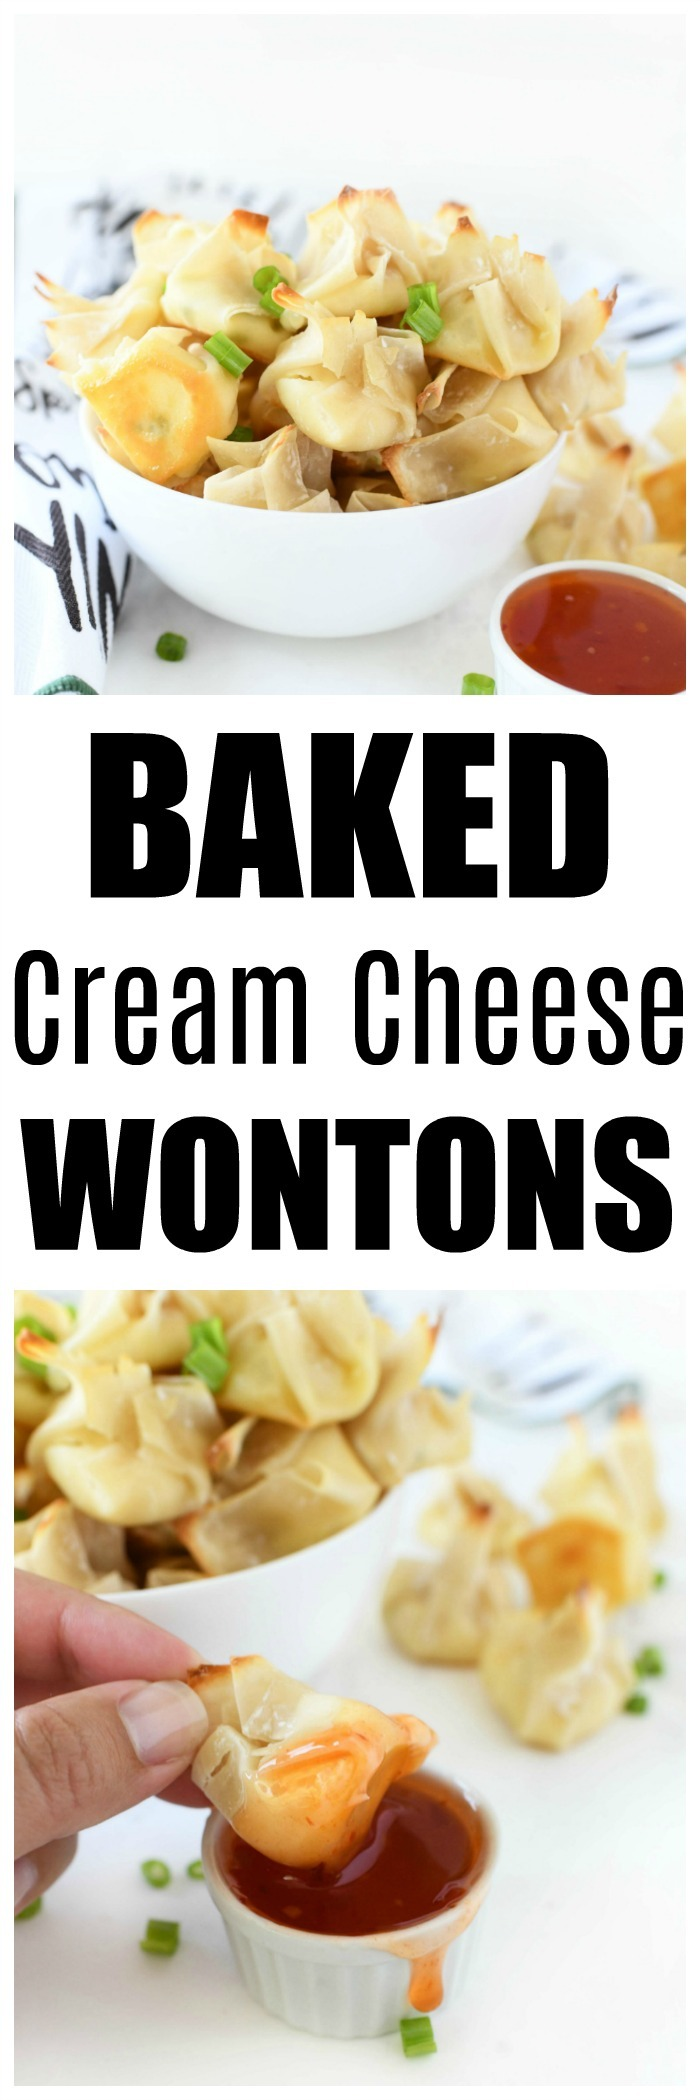 Baked Cream Cheese Wontons